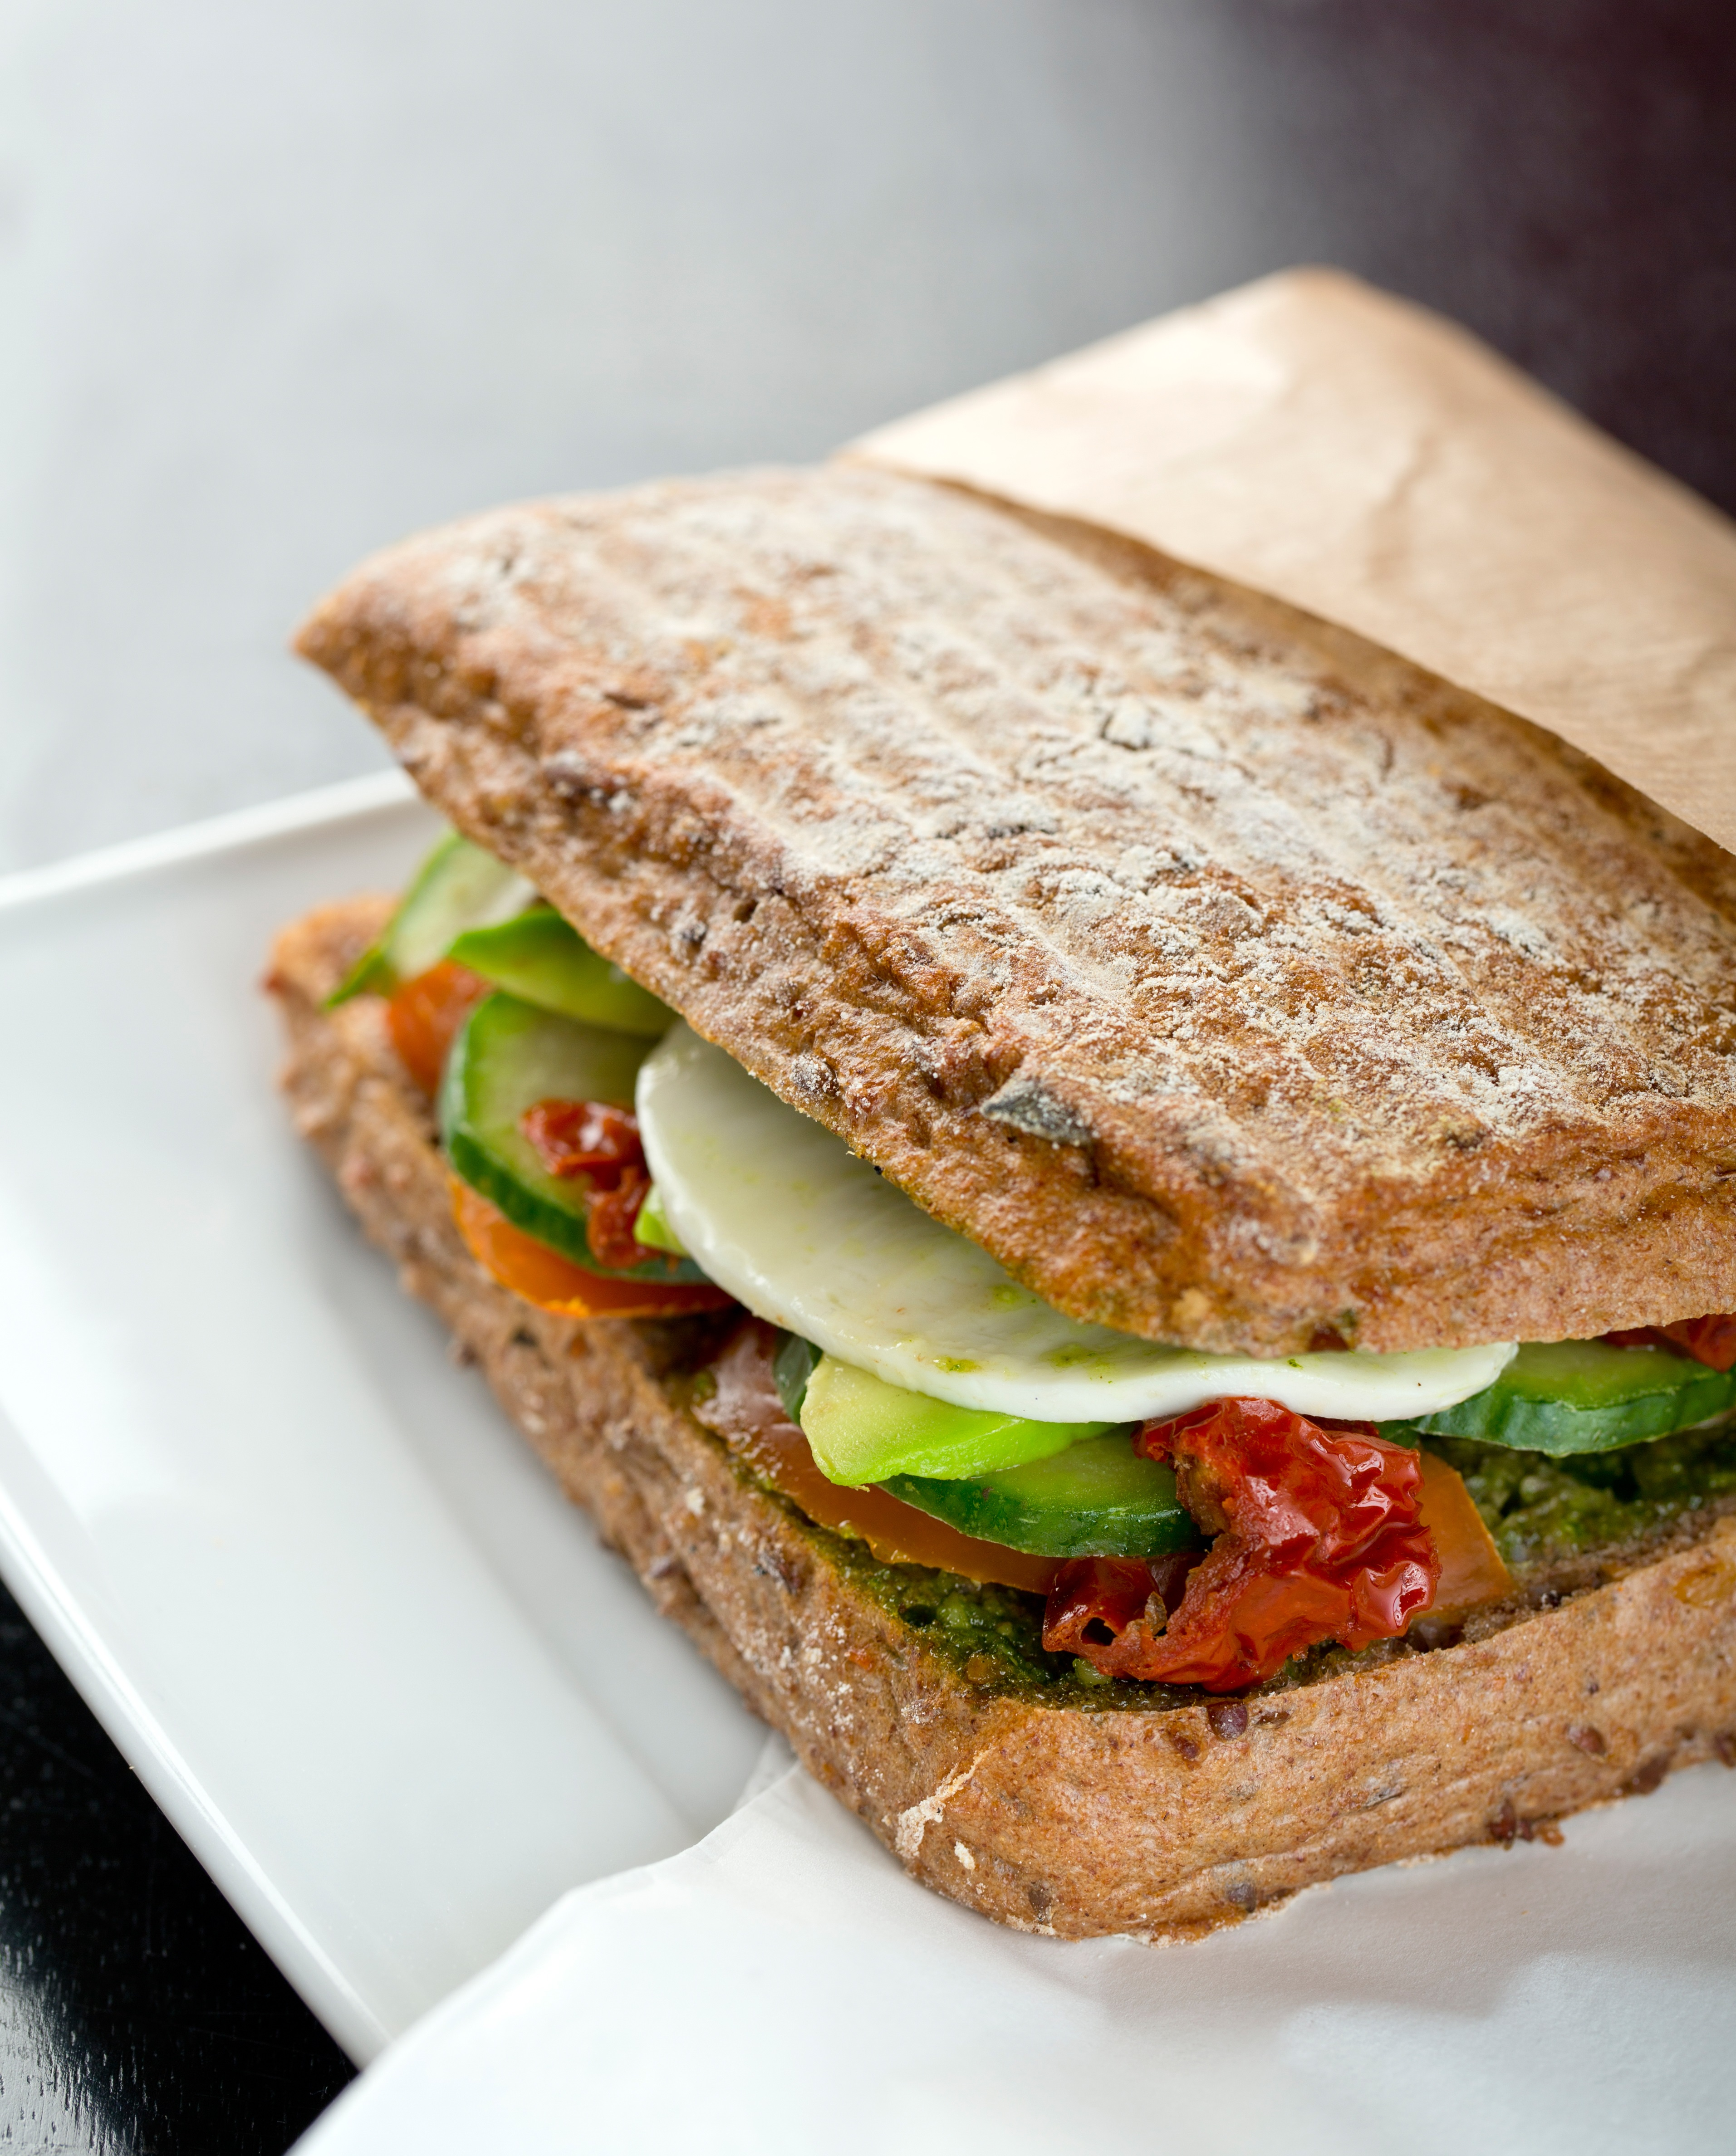 ... Dish Sandwiches and Wraps Mozzarella, Tomato, Pesto & Avocado Sandwich